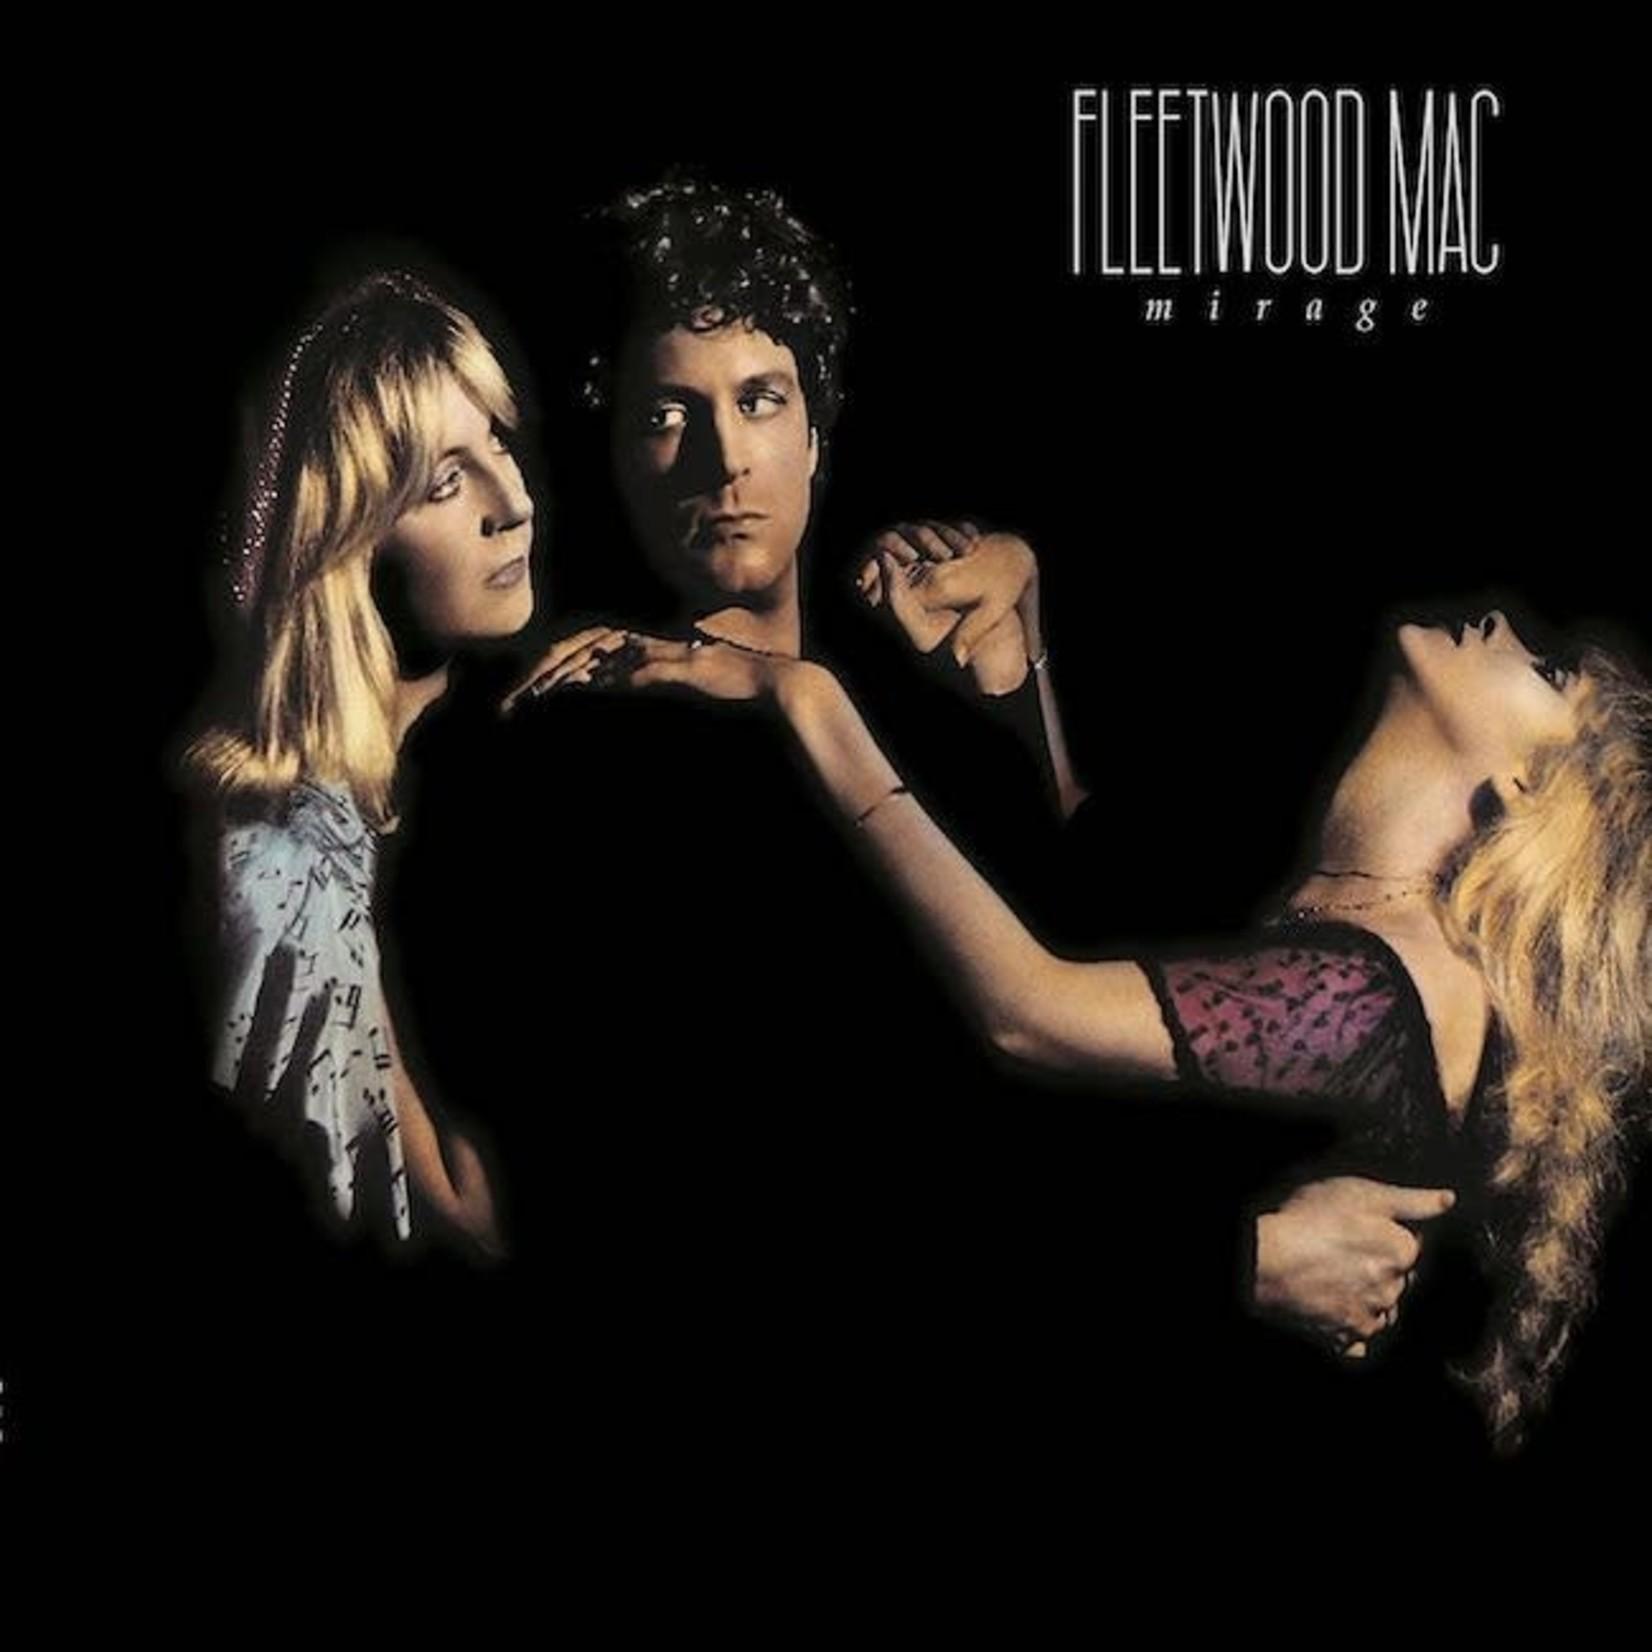 [Vintage] Fleetwood Mac: Mirage